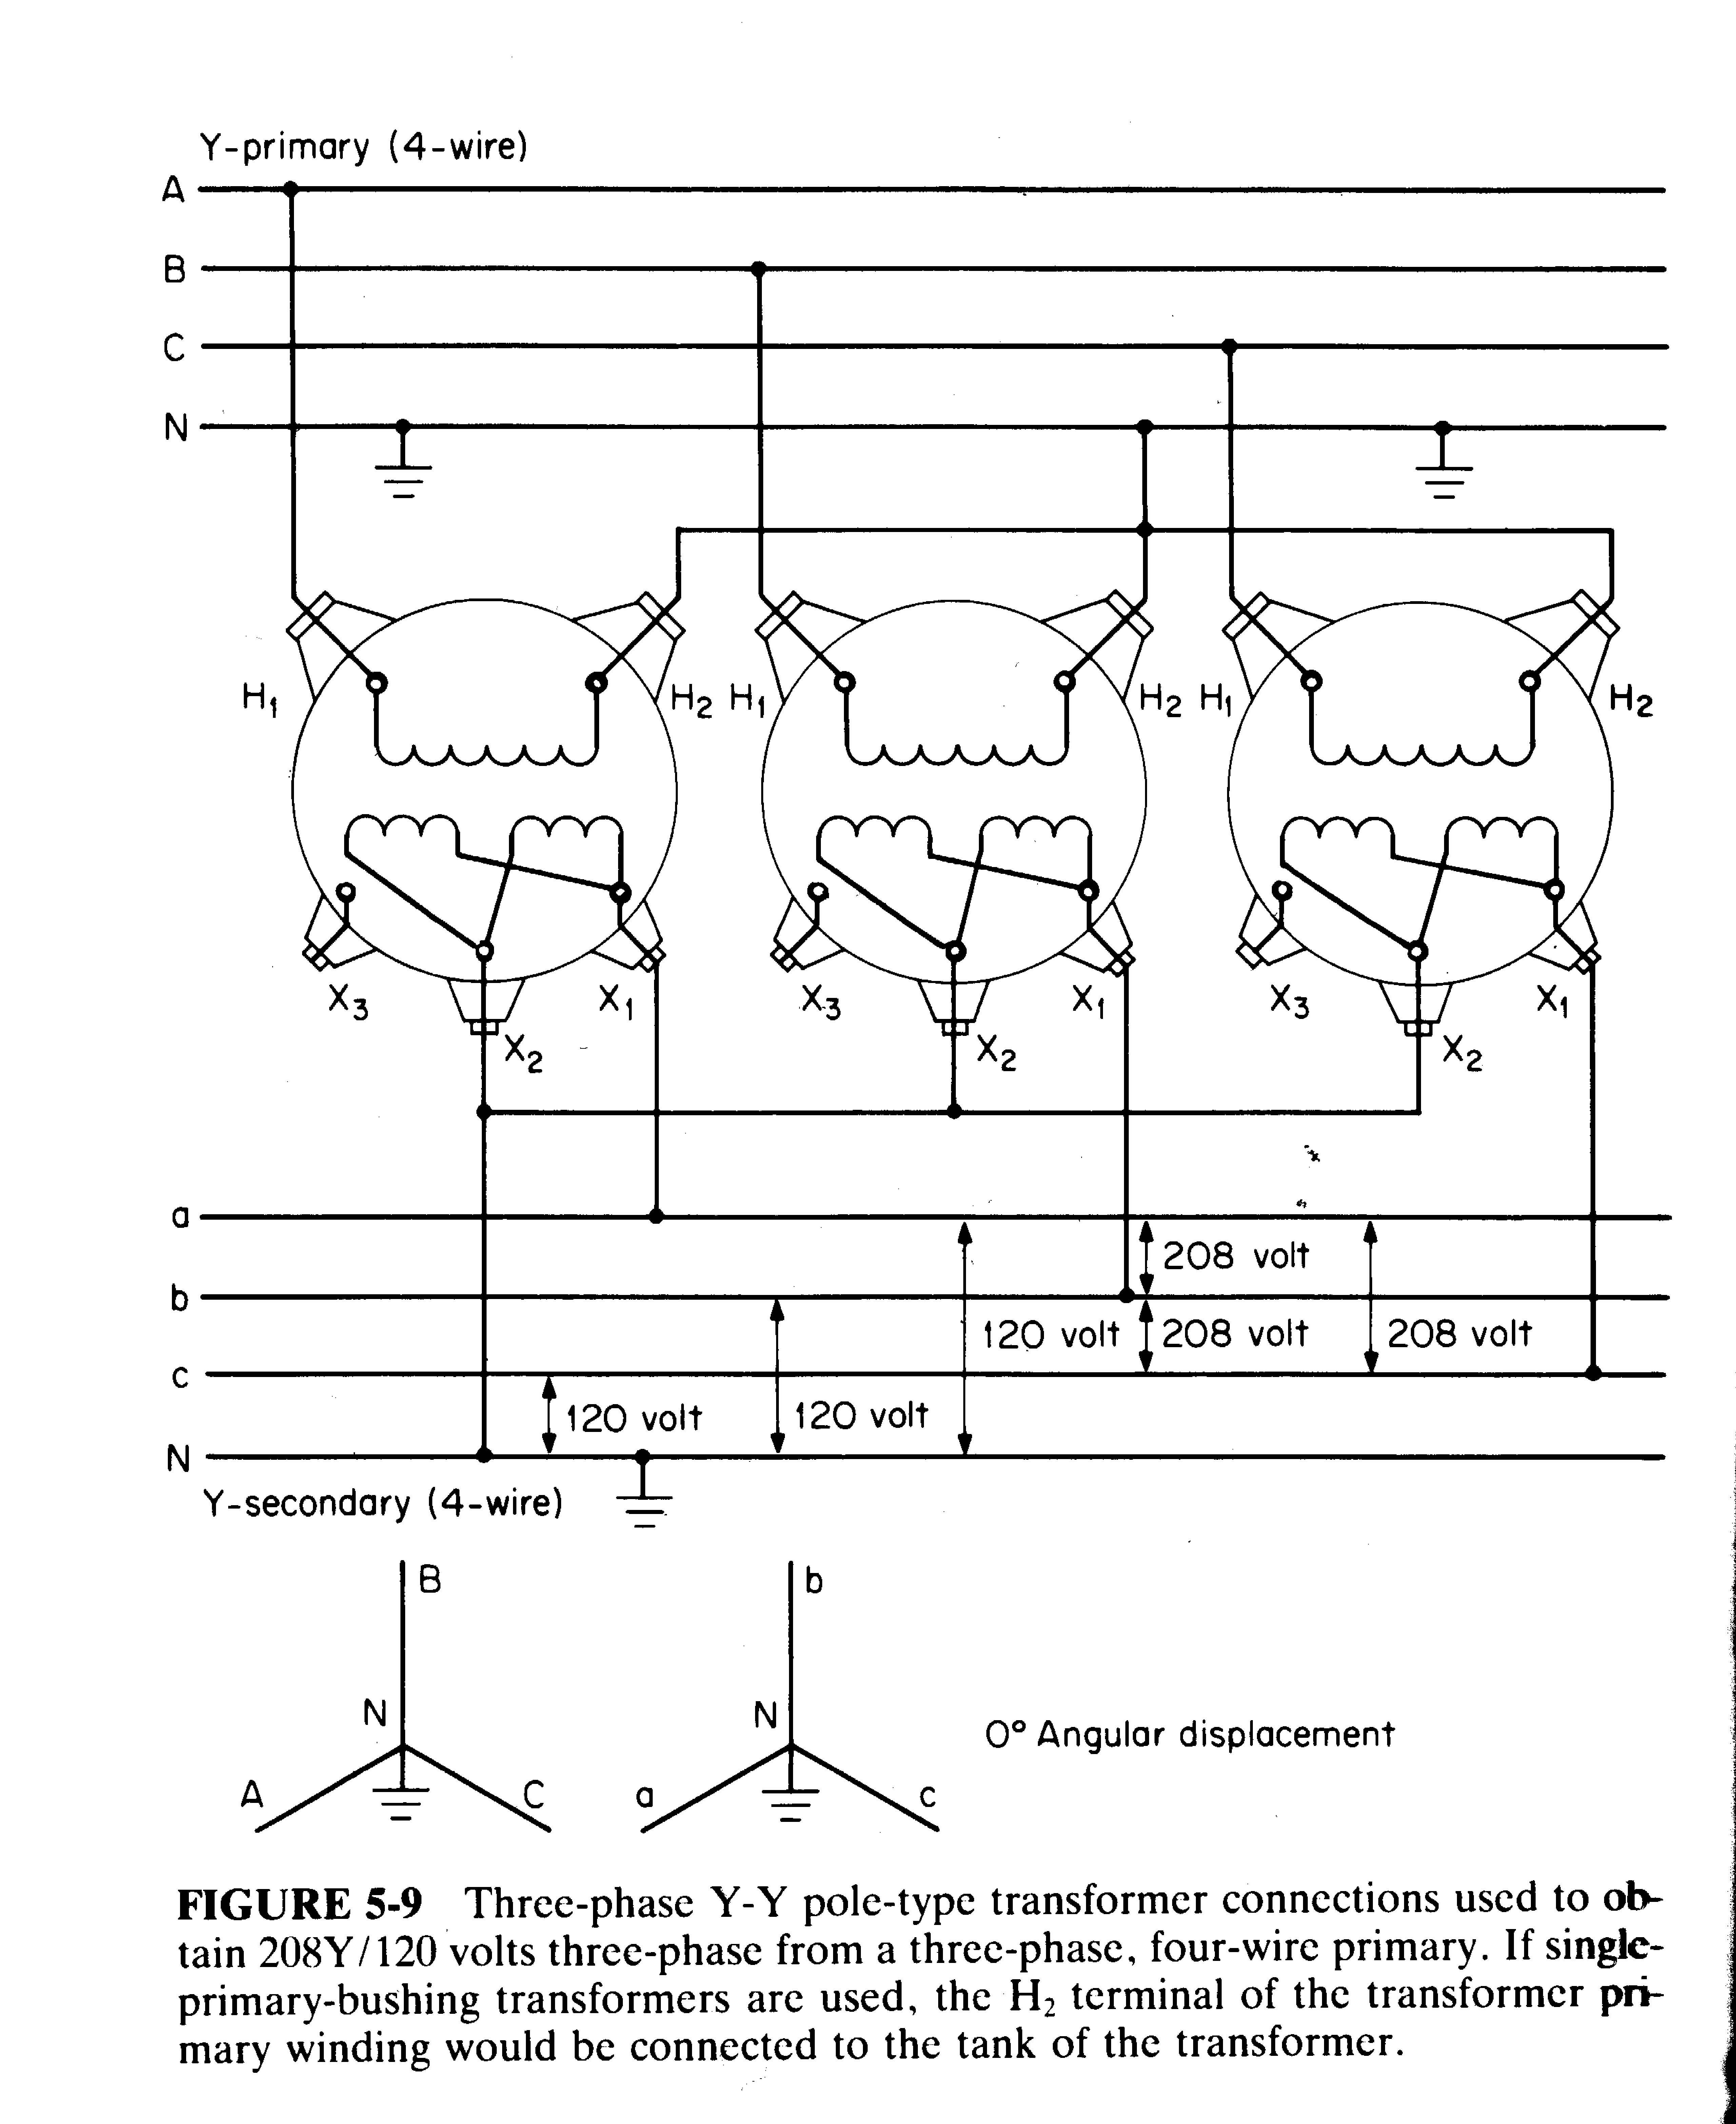 3 Phase Wire Diagram 480v 3 Phase Delta Transformer Wiring Diagram Wiring Data Of 3 Phase Wire Diagram